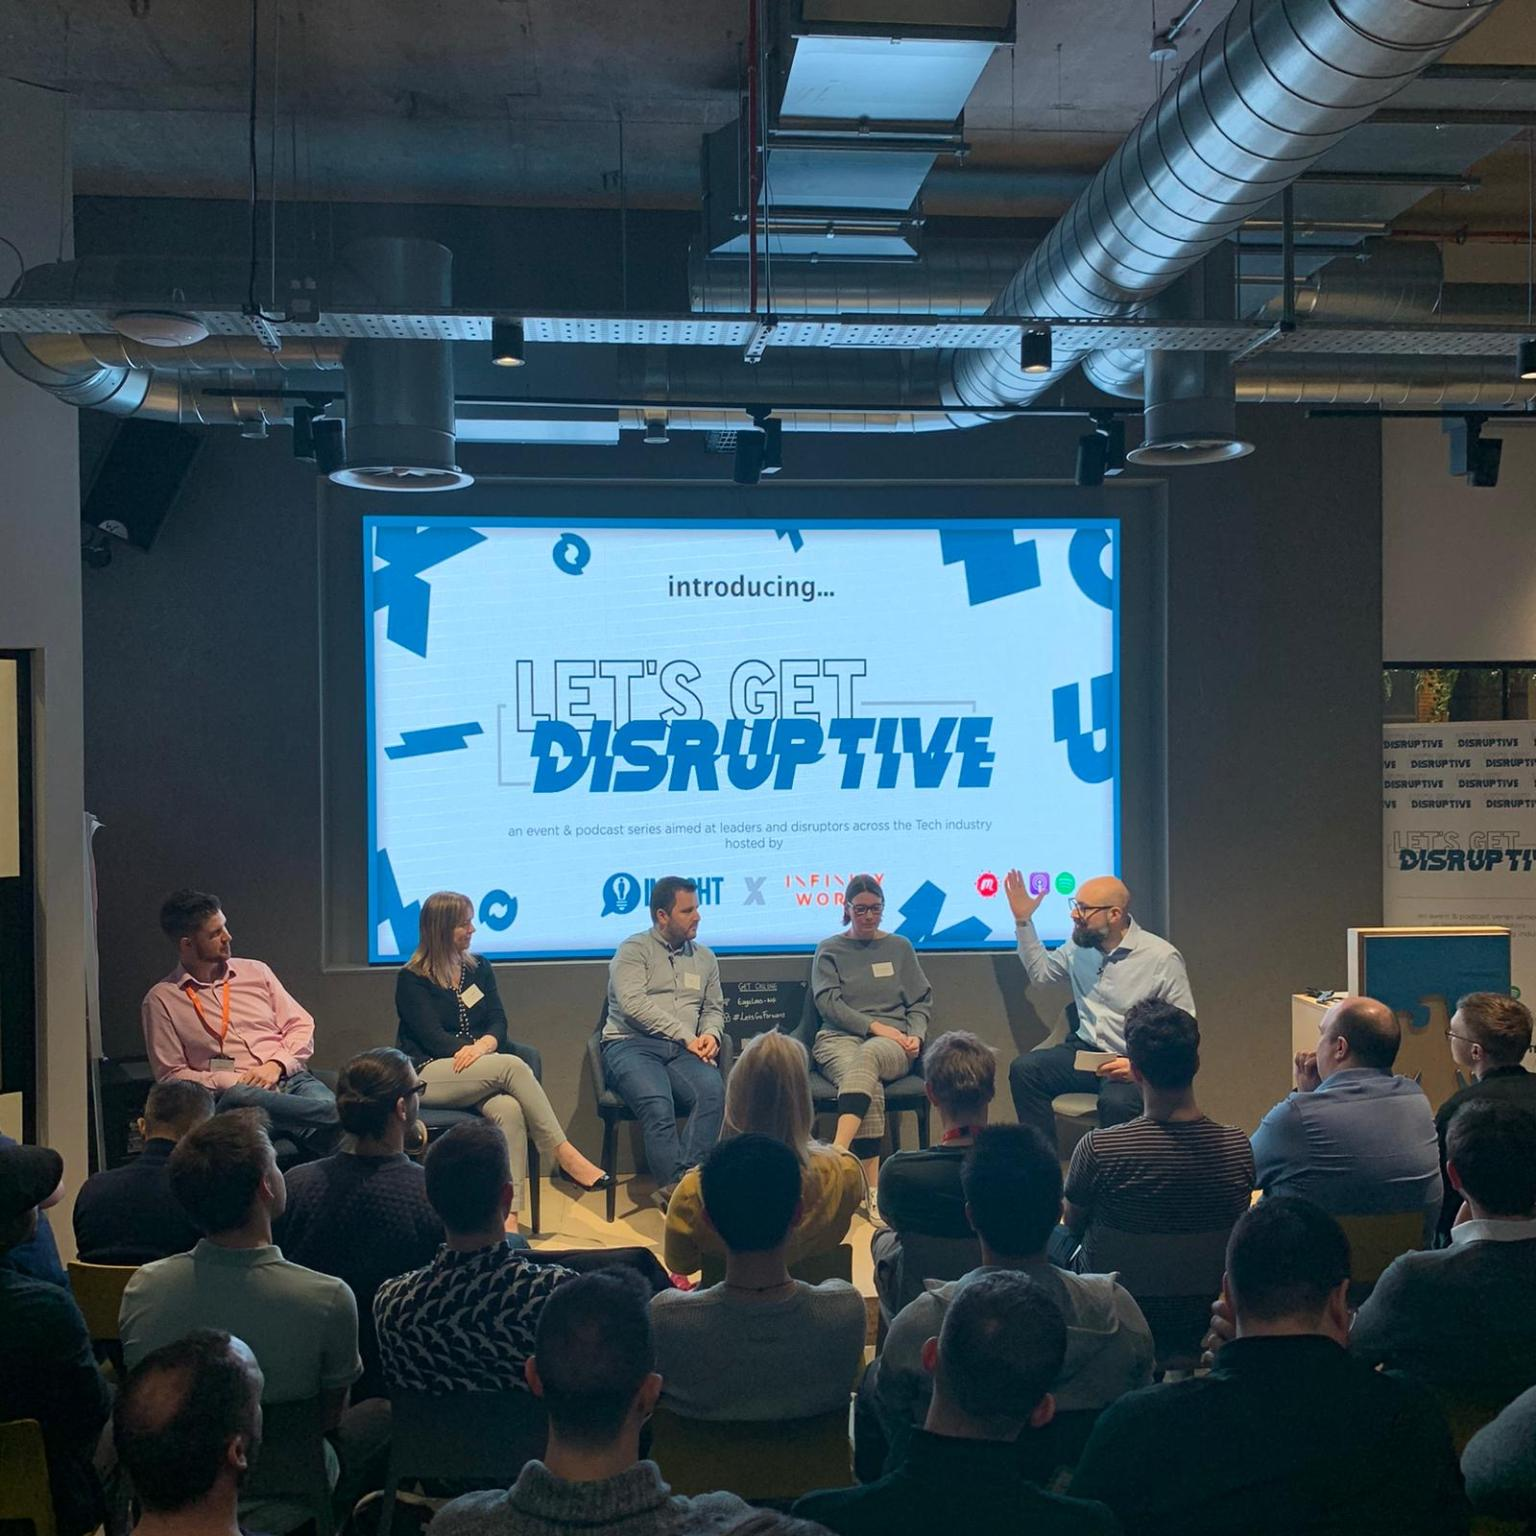 Let's Get Disruptive 2